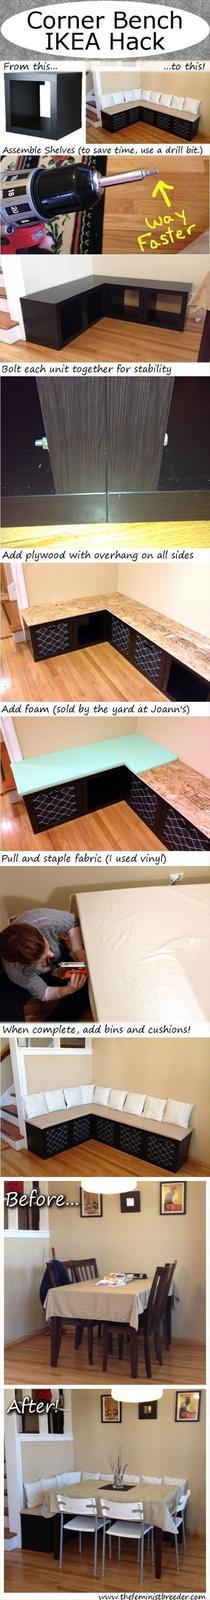 Trochu jiná Ikea....:-) - Obrázek č. 82